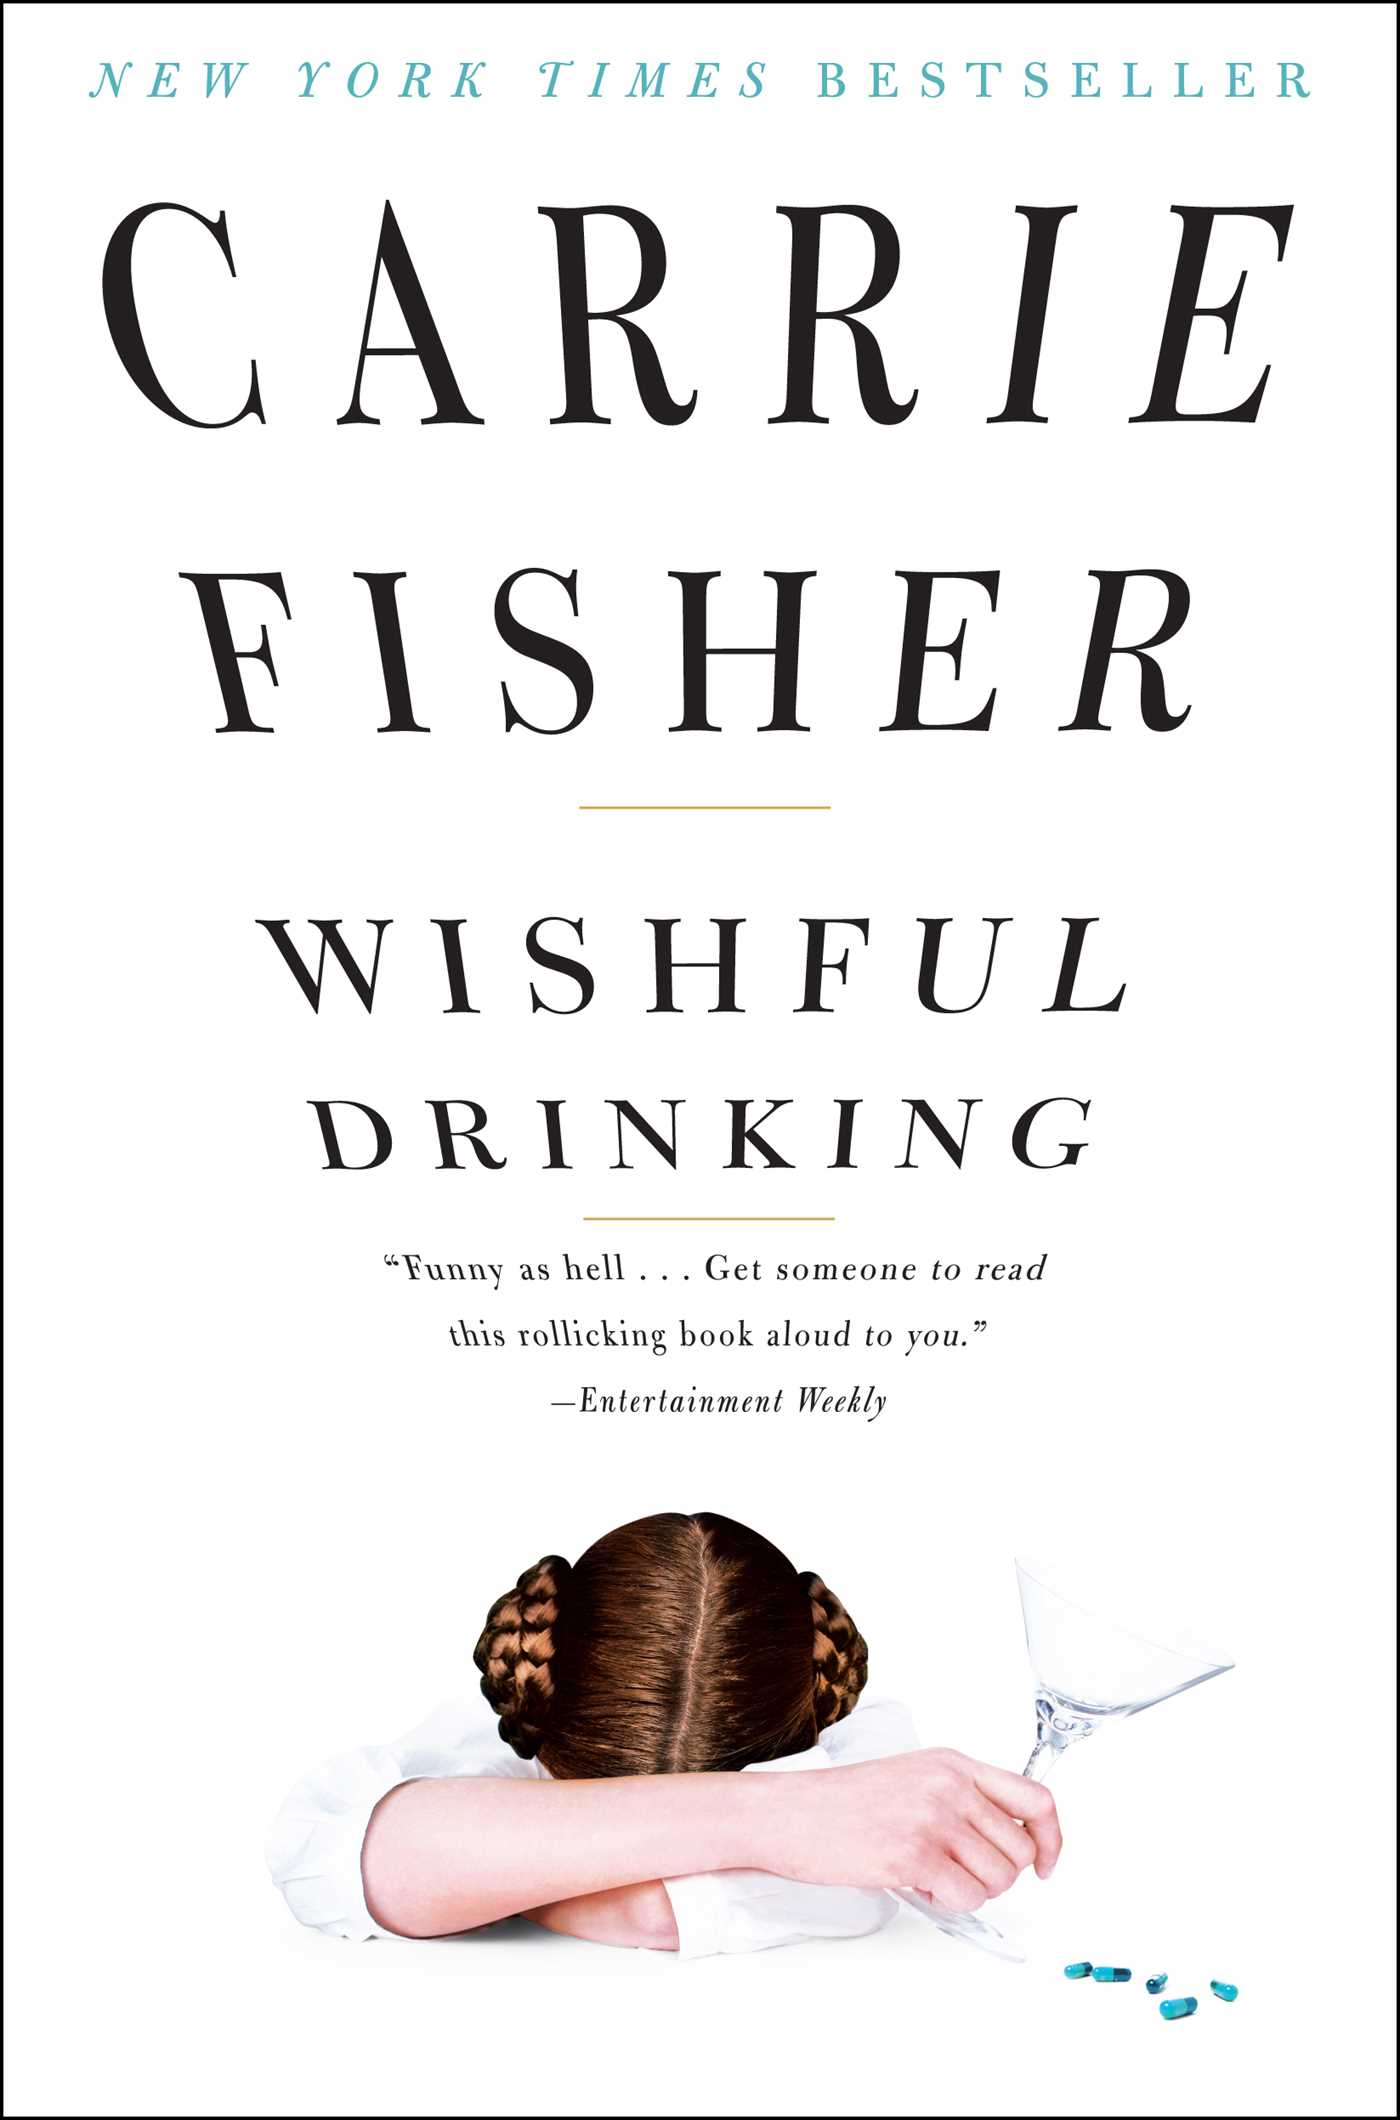 Wishful drinking 9781439153802 hr